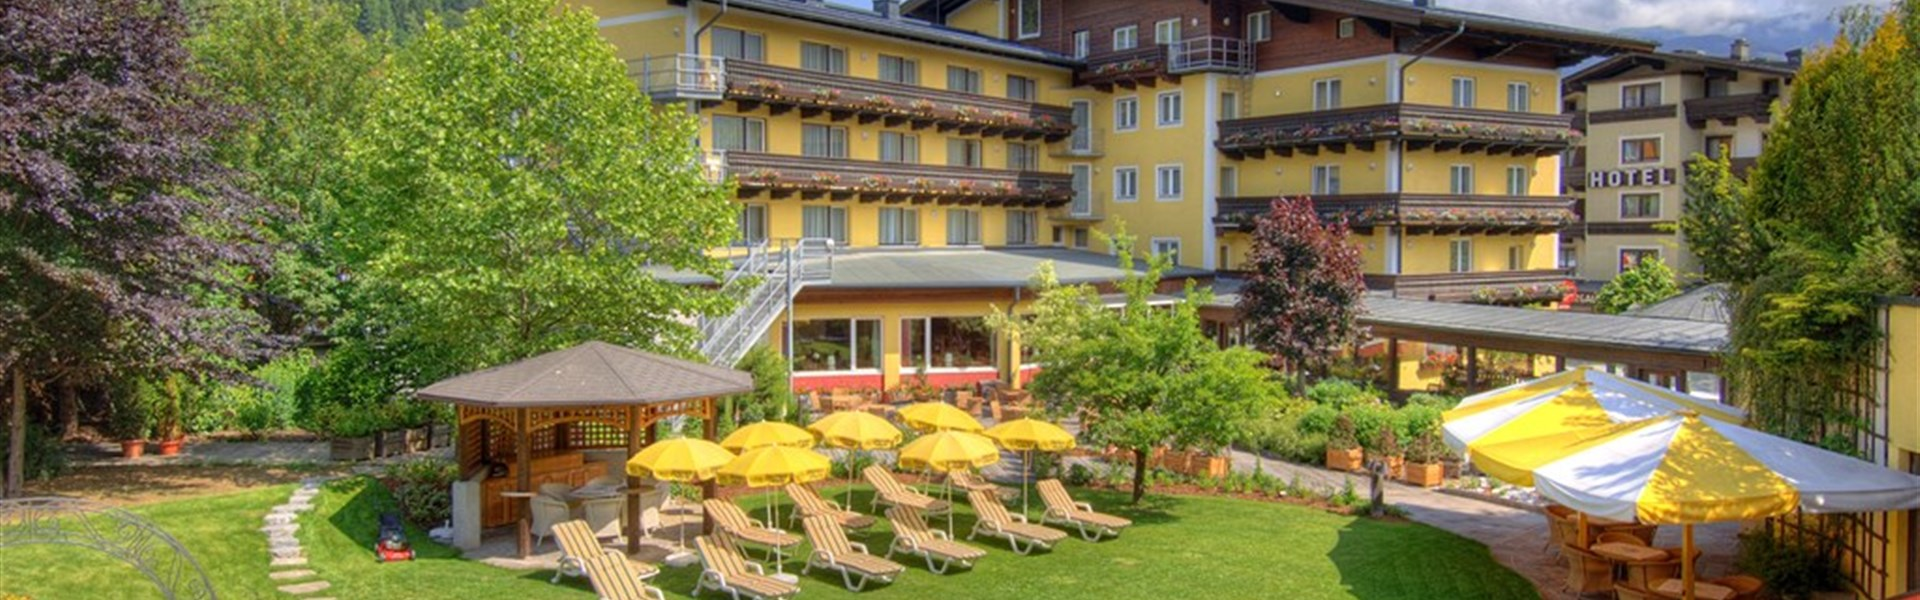 Marco Polo - Hotel Schütthof -